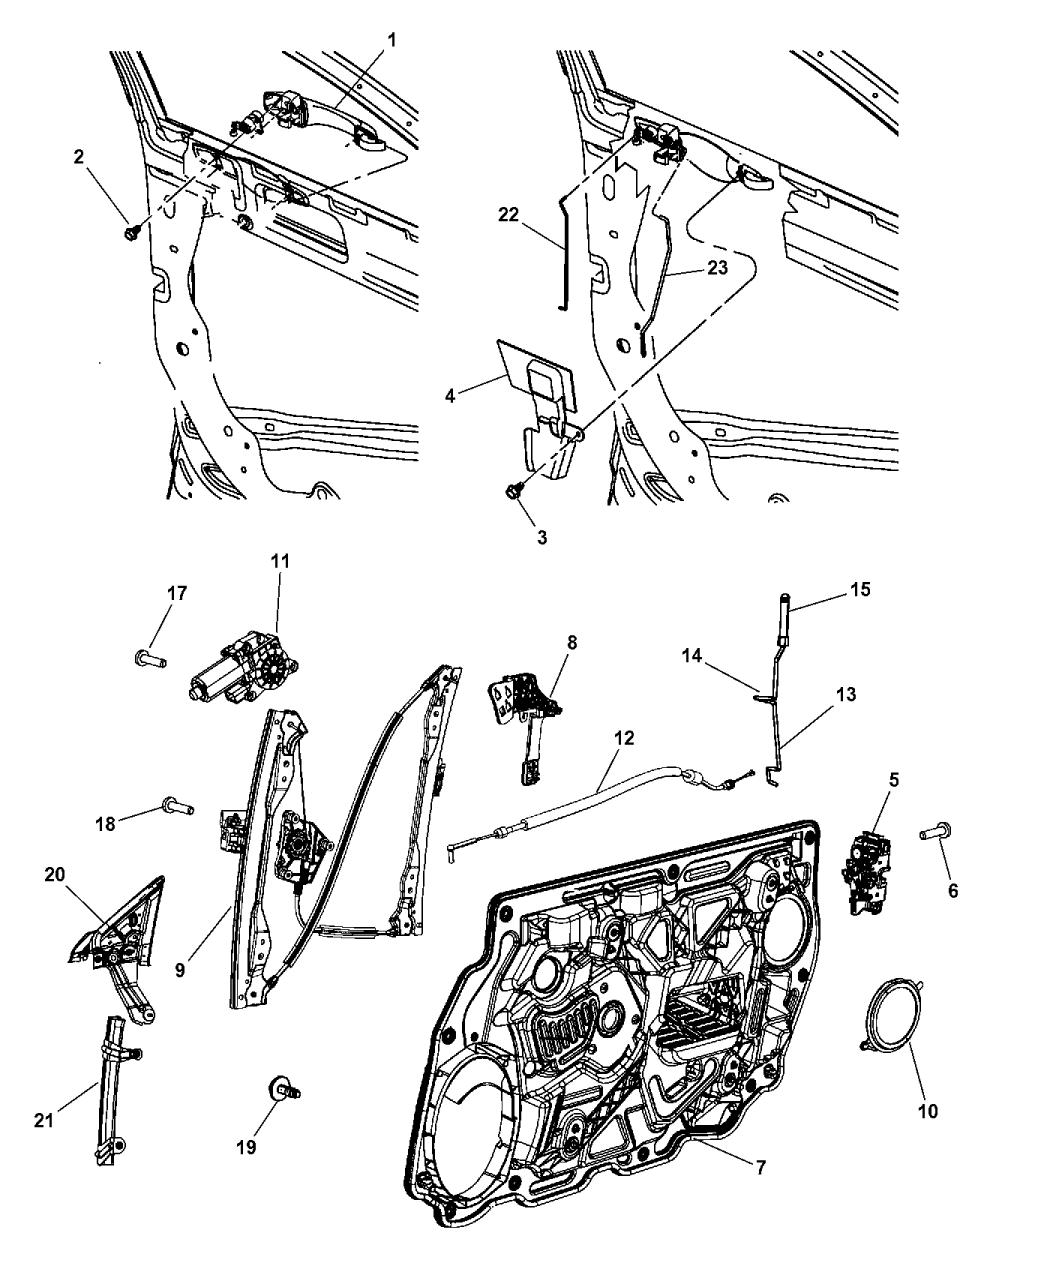 26 2008 Chrysler Sebring Convertible Parts Diagram